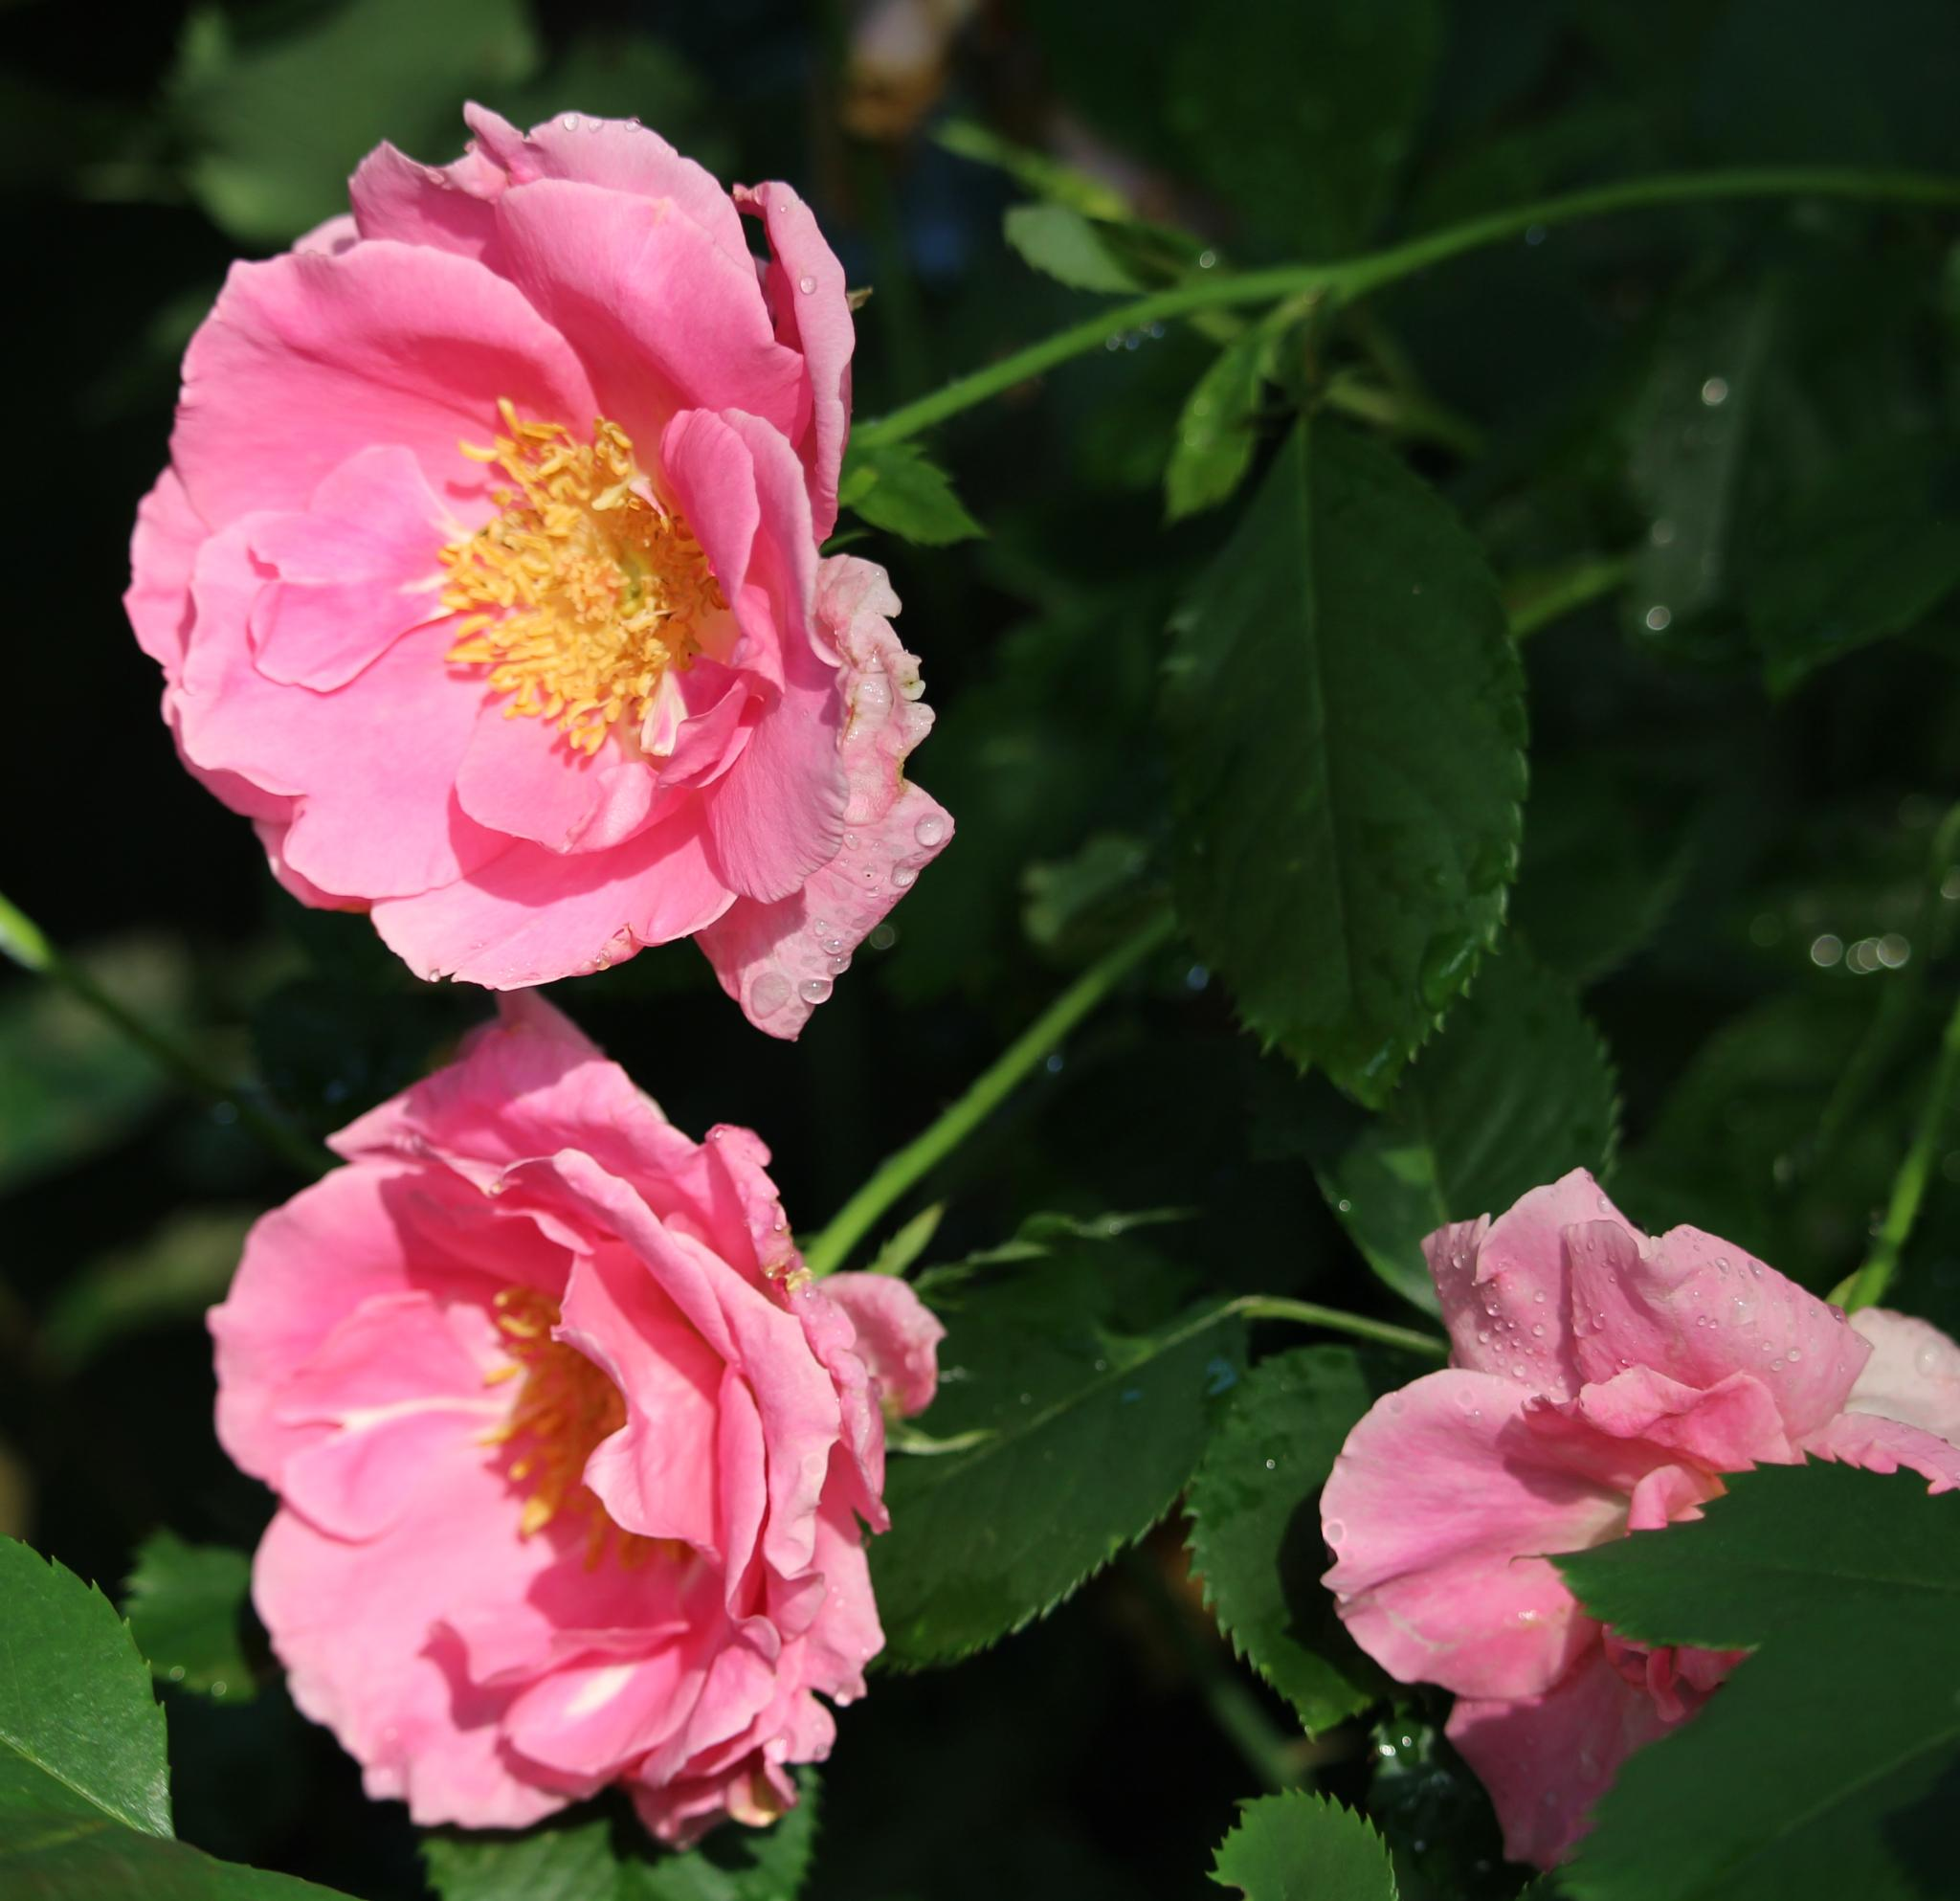 Knockout rose in pink by Susan J Wadlow